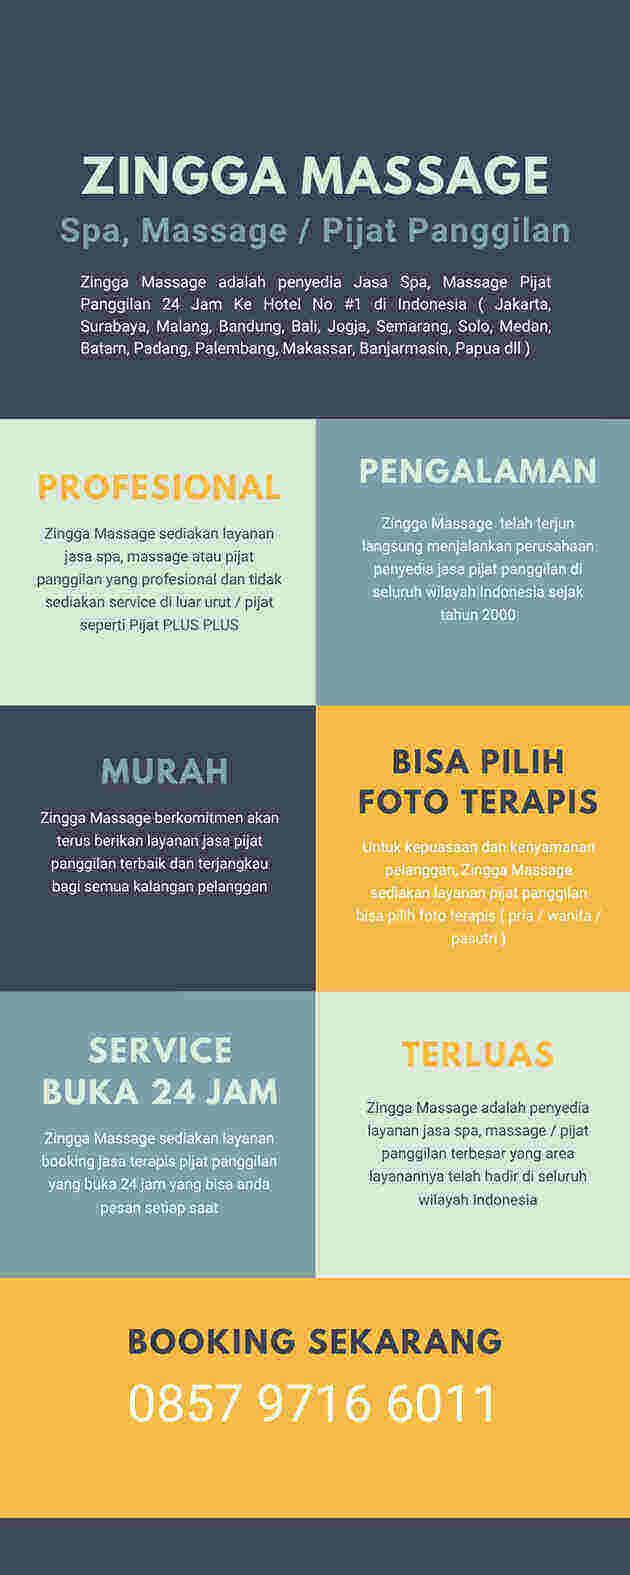 jasa_spa_massage_pijat_panggilan_24_jam_hotel_terapis_pria_wanita_pasutri_plus_harga_murah_infographic_3_1